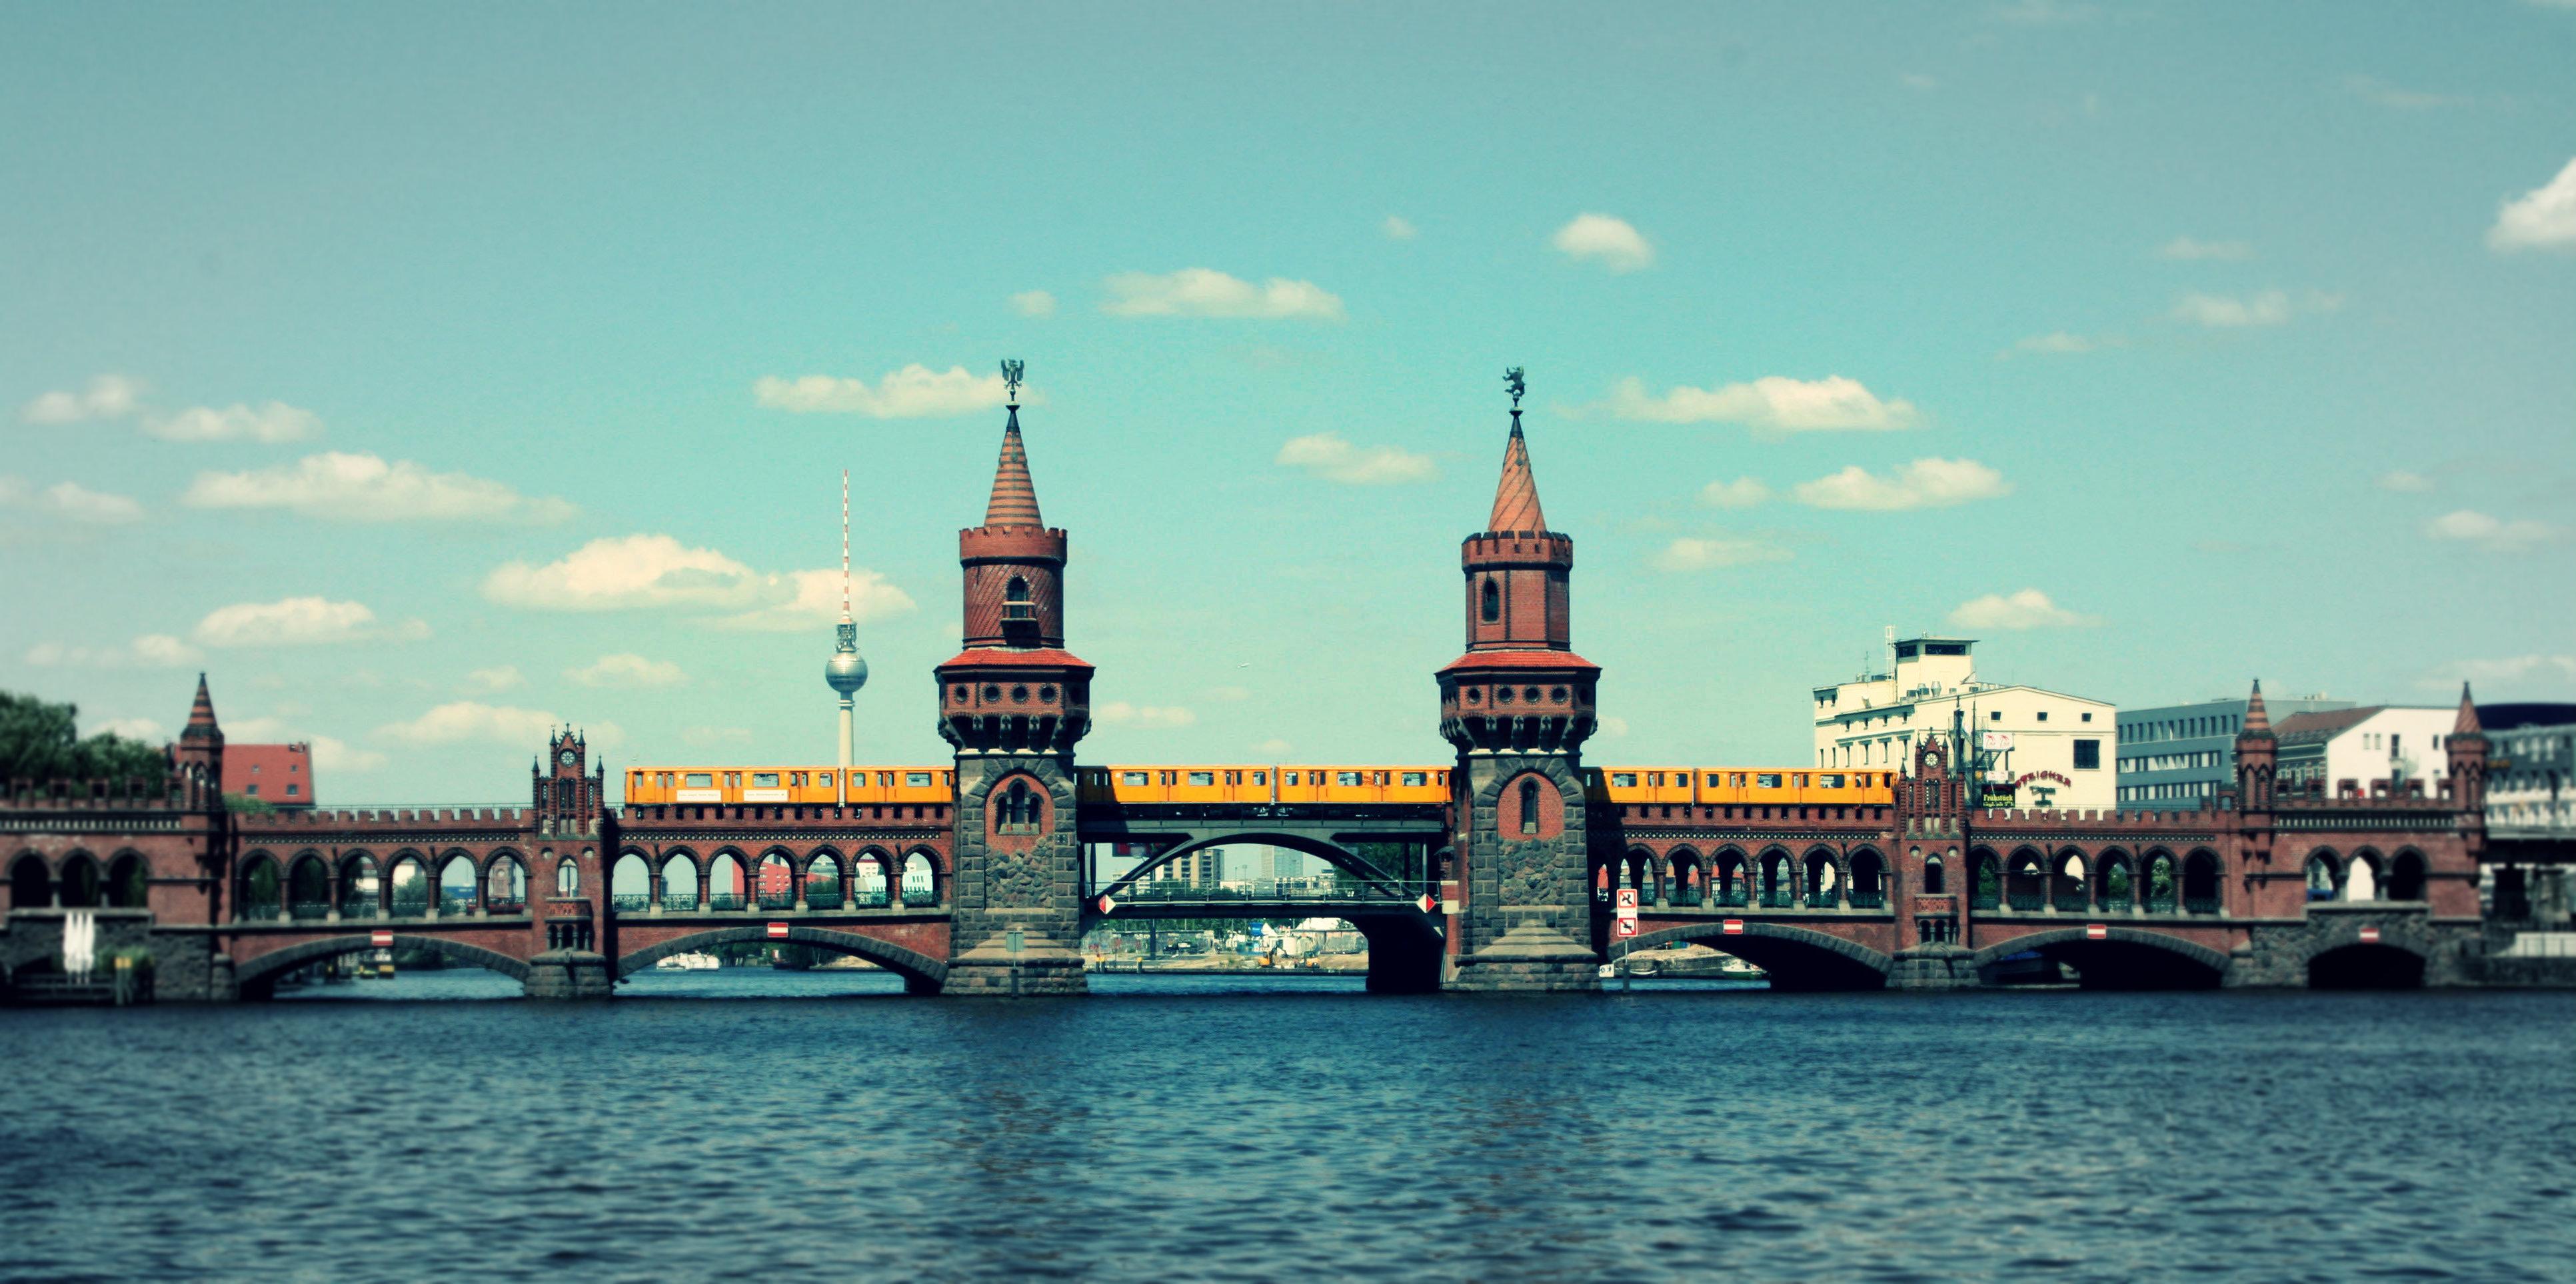 Oberbaumbrücke_mit_U-Bahn_v1